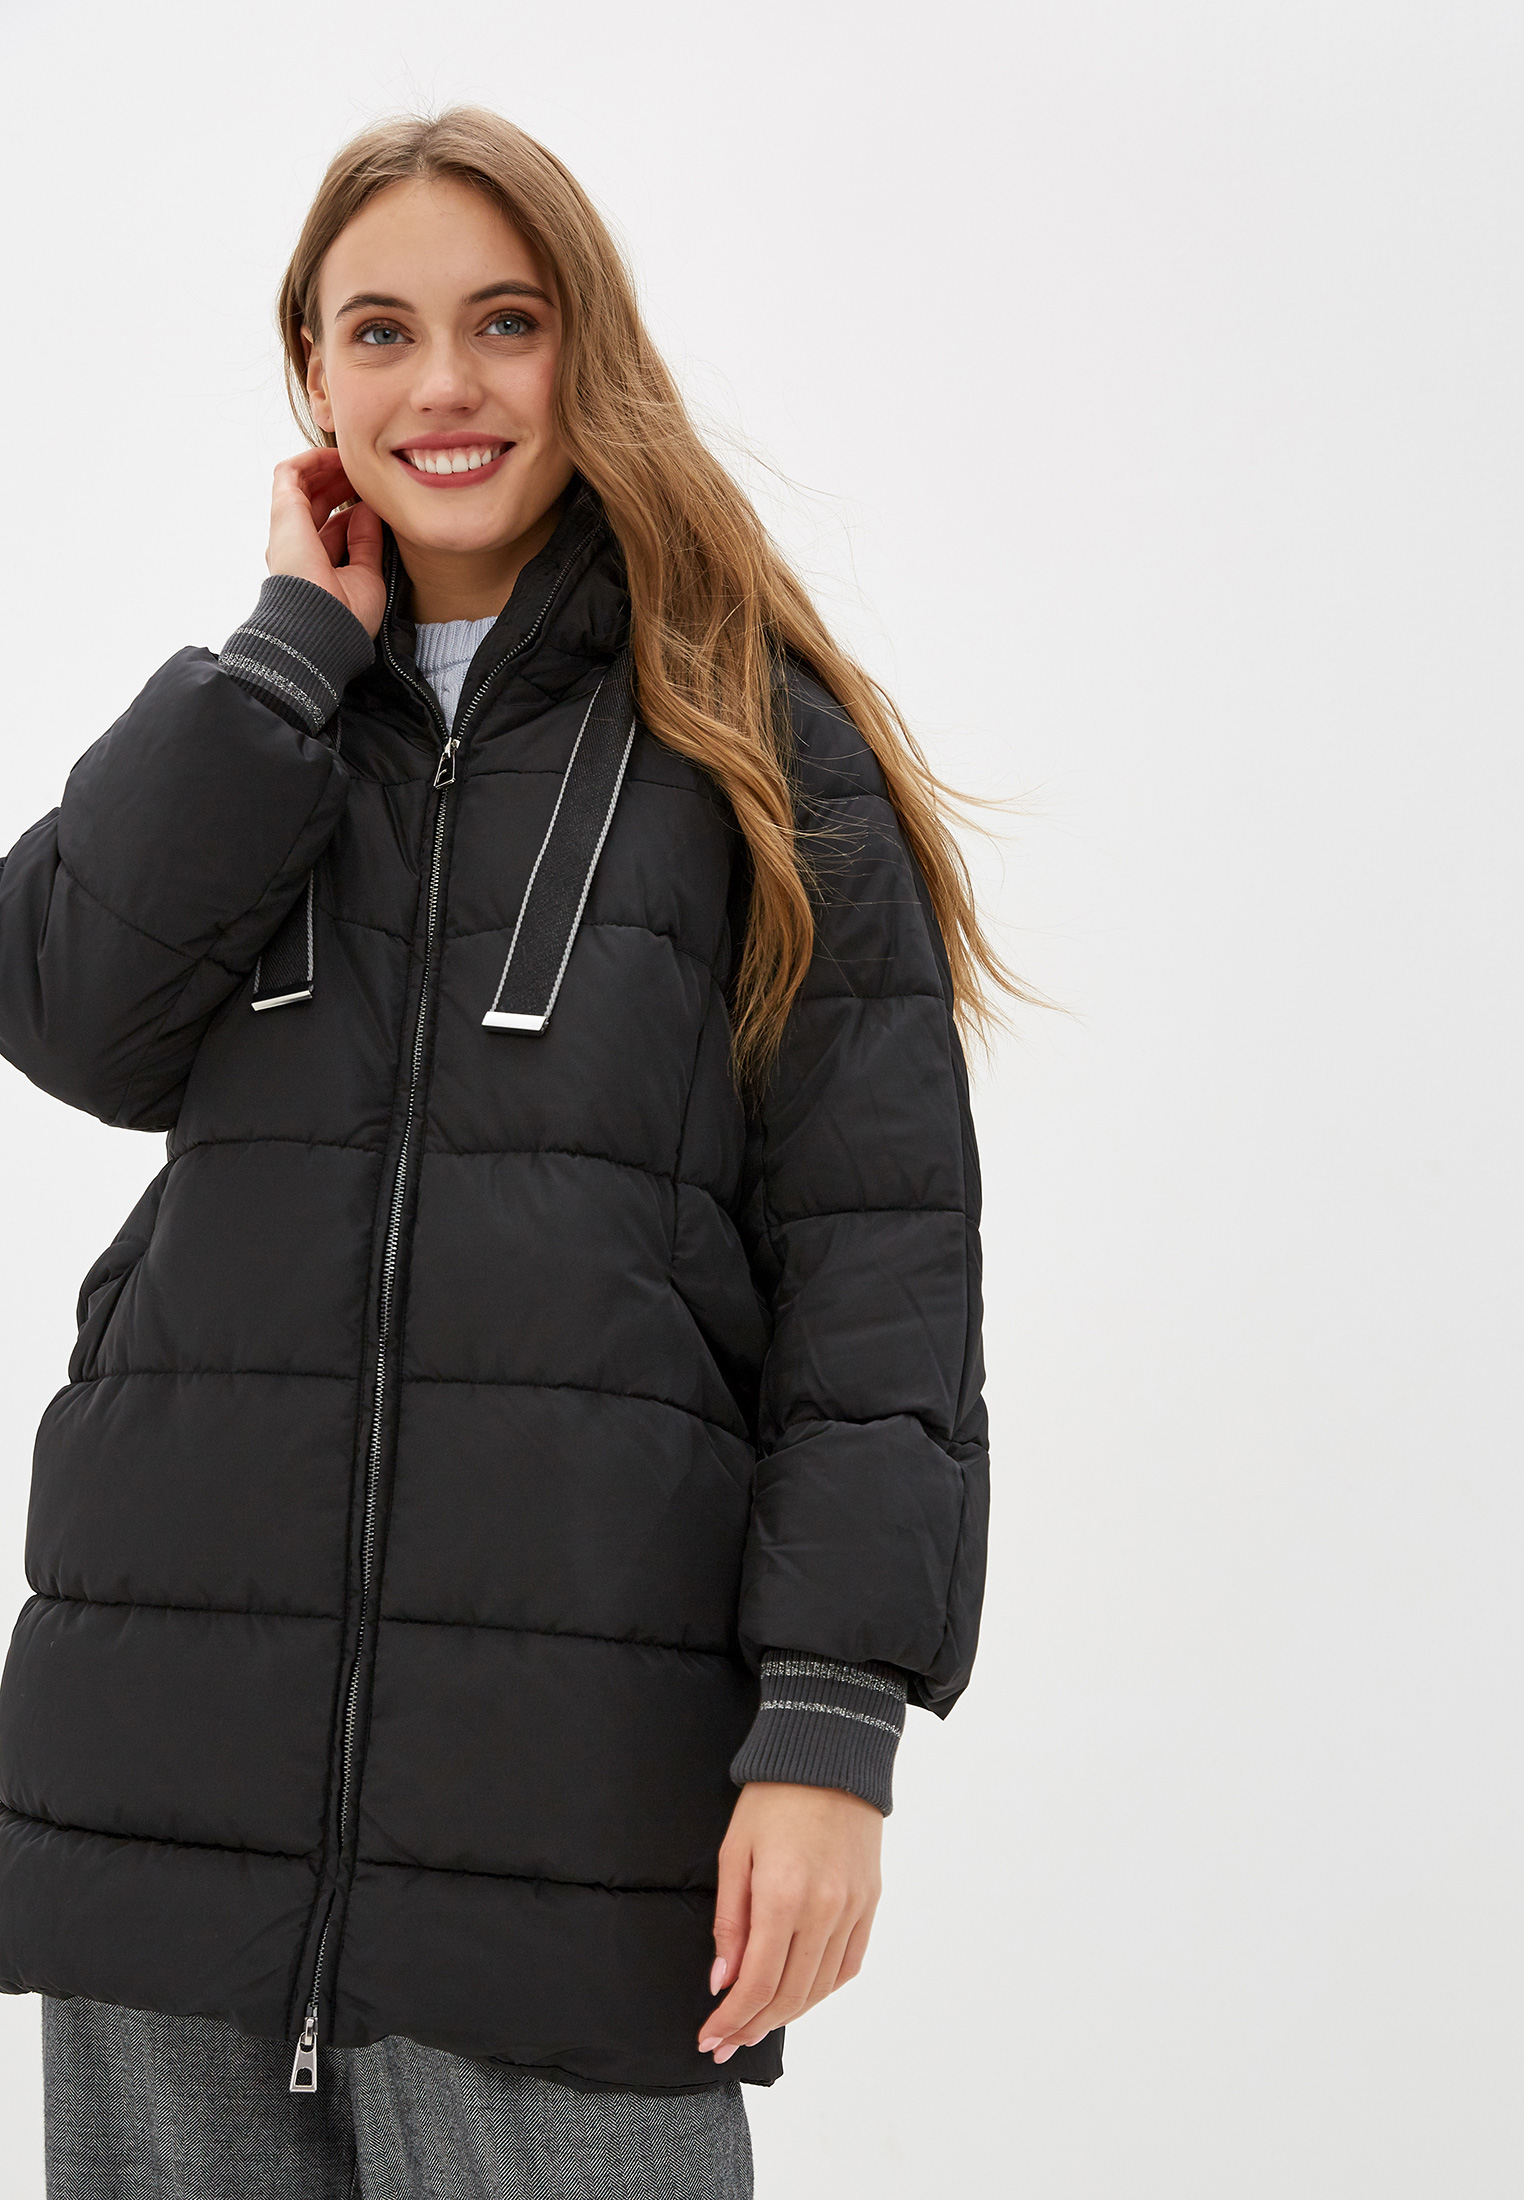 Куртка утепленная, O'stin, цвет: черный. Артикул: OS004EWGUKP2. Одежда / Верхняя одежда